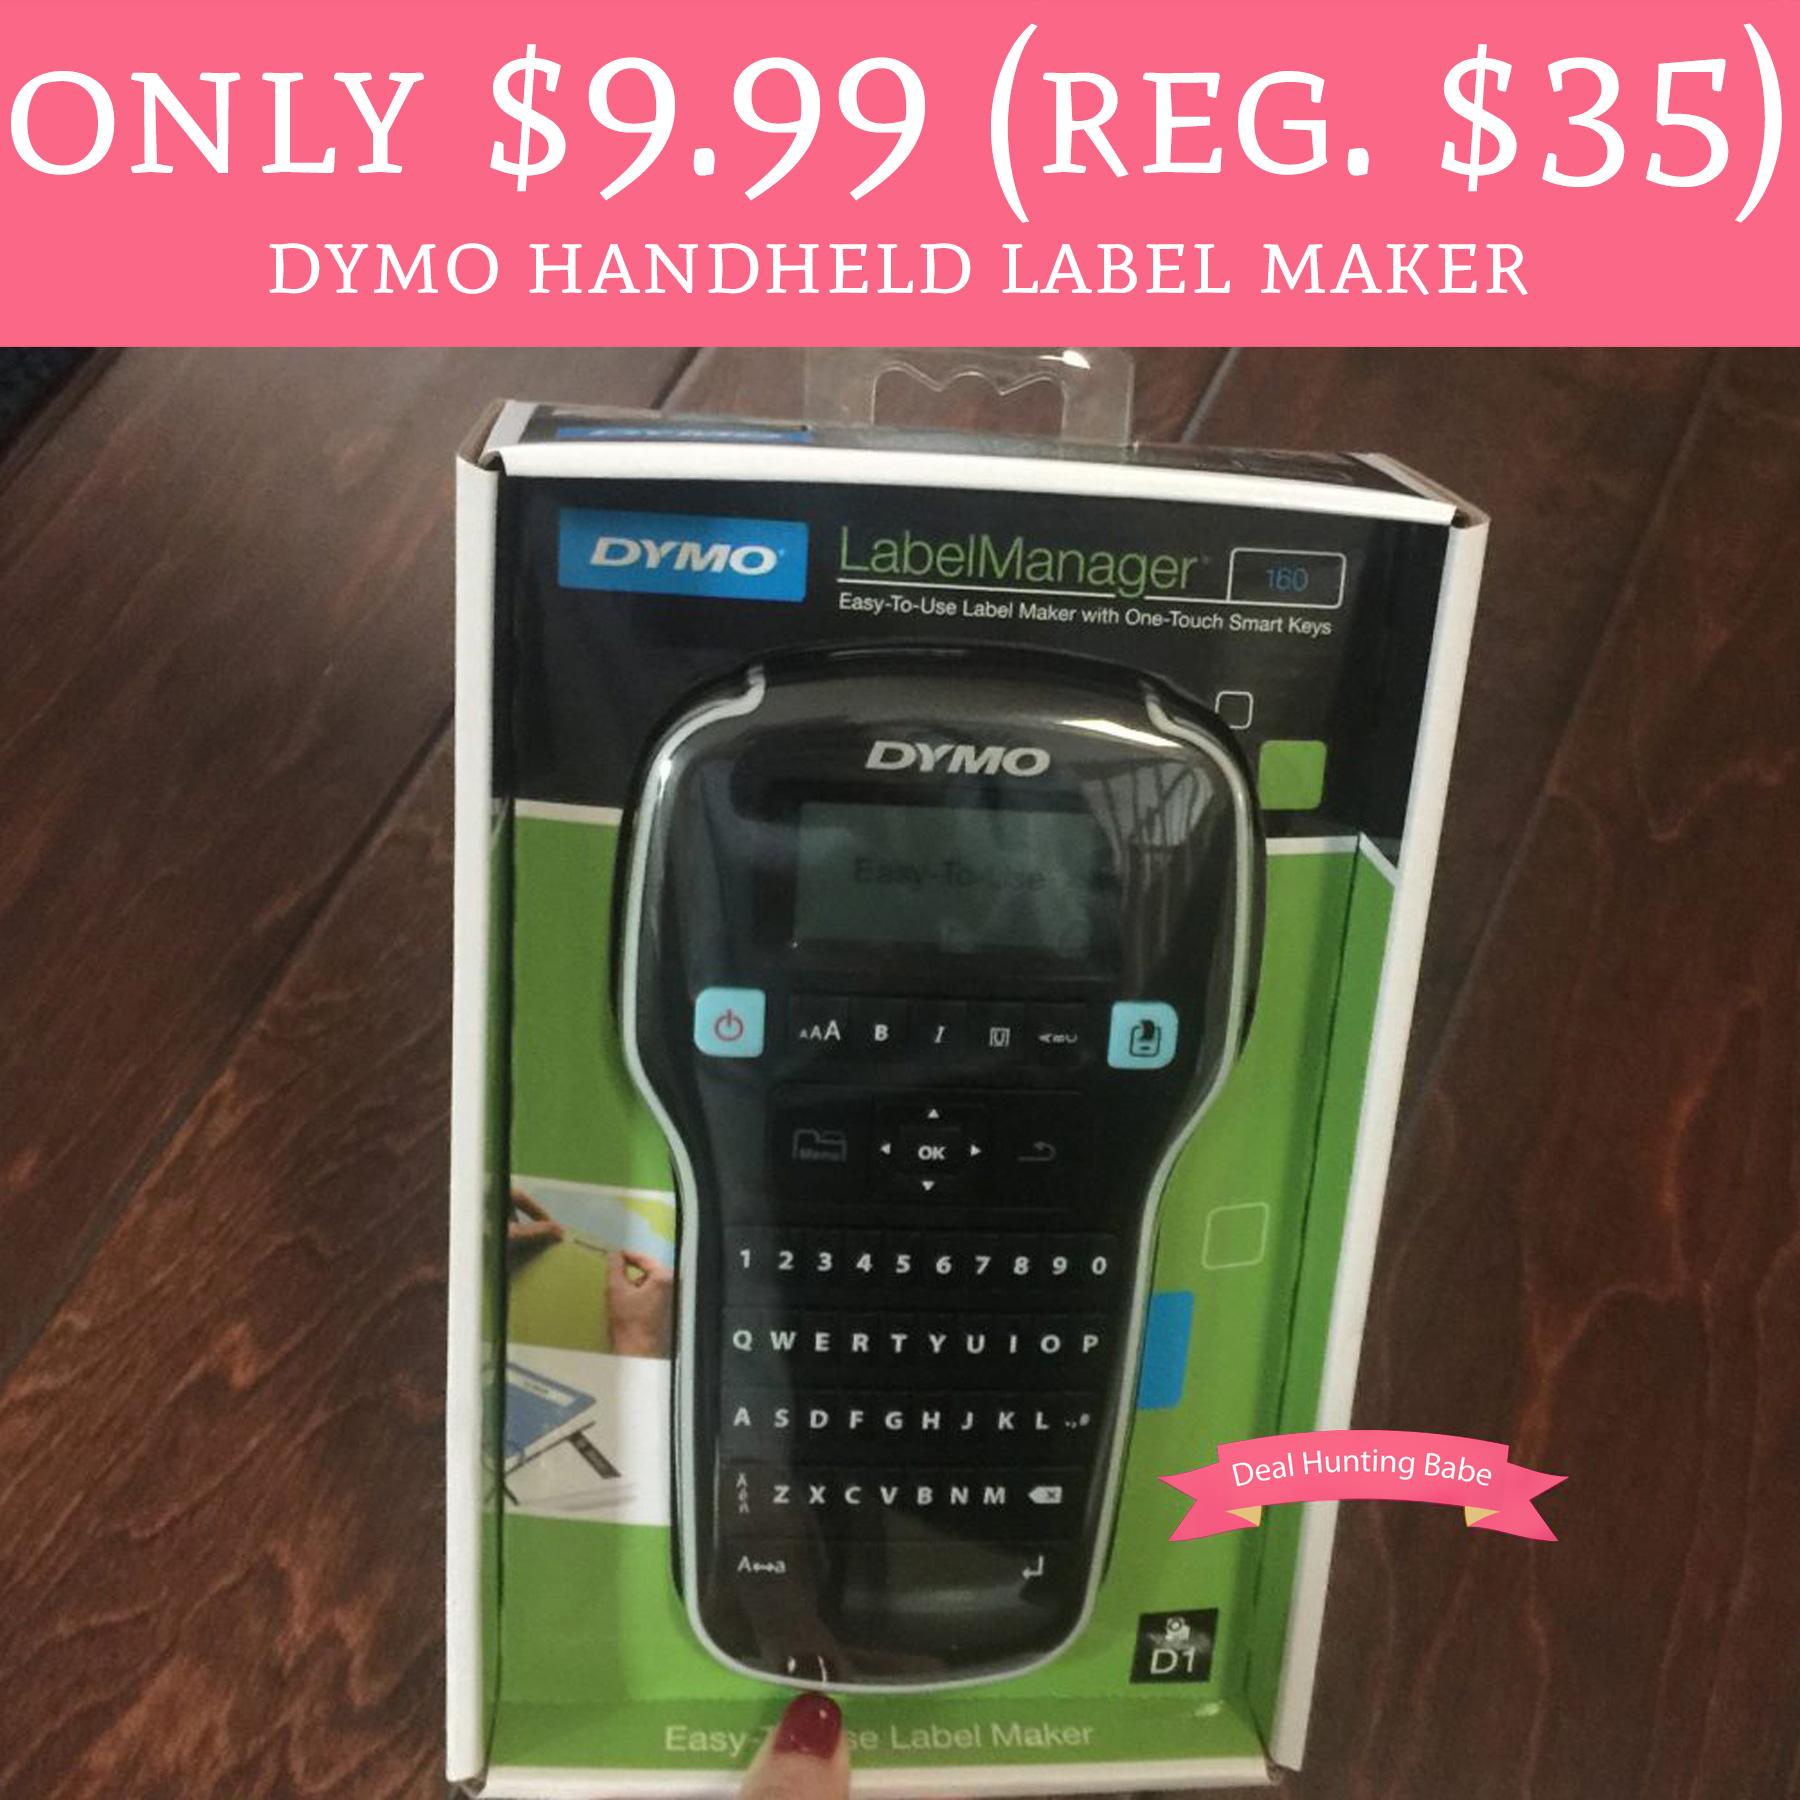 Only 999 Reg 35 DYMO Handheld Label Maker Free Shipping – Free Shipping Label Maker